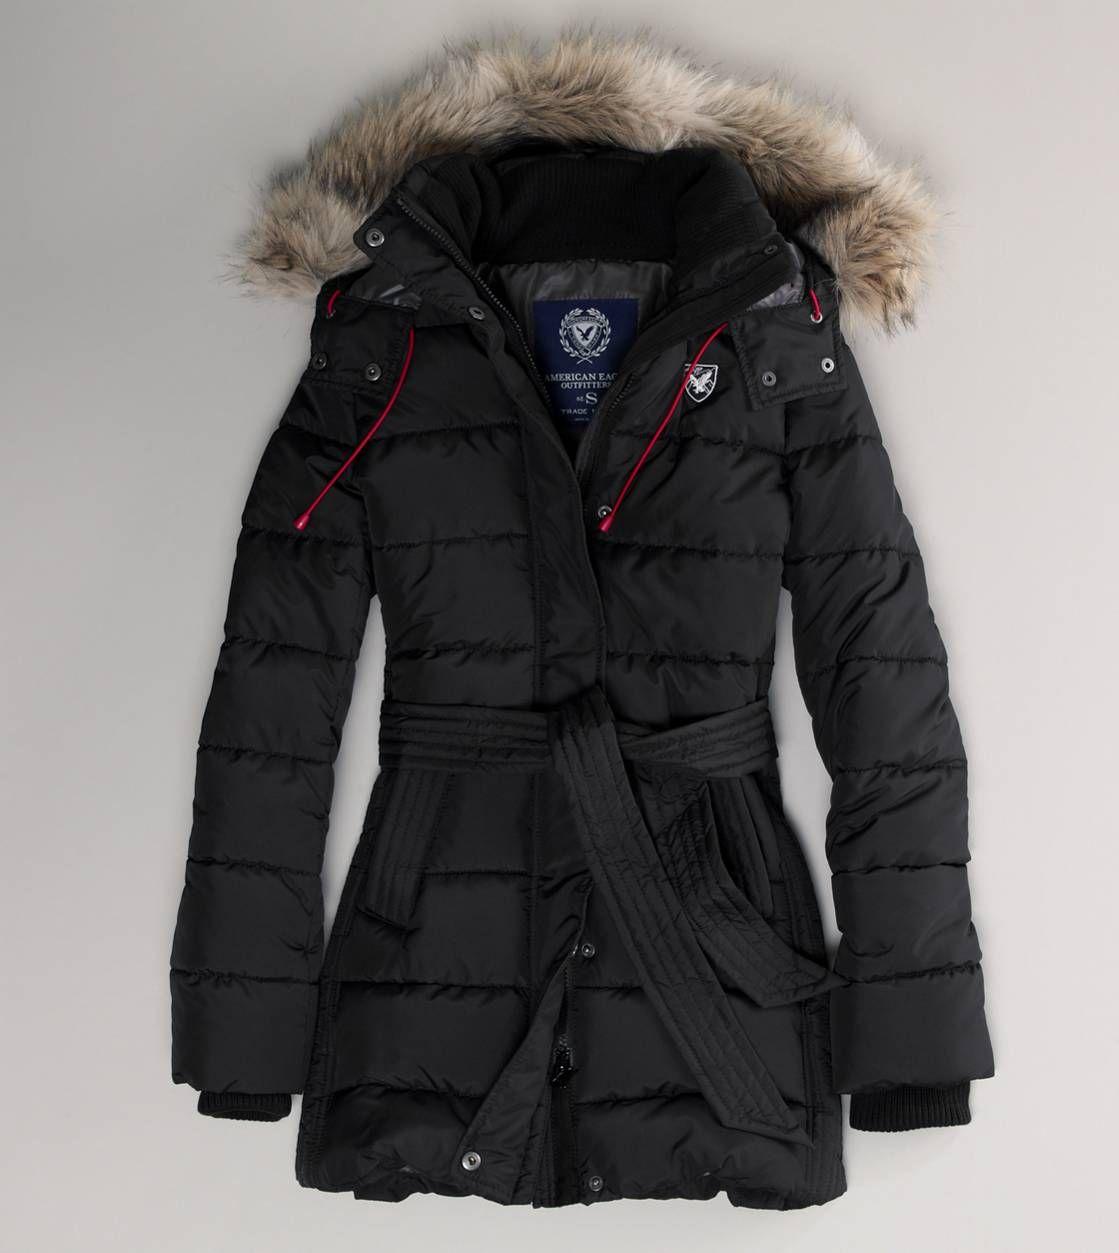 New Arrivals Women American Eagle Outfitters Black Puffer Coat Black Puffer Jacket Women S Puffer Coats [ 1253 x 1119 Pixel ]